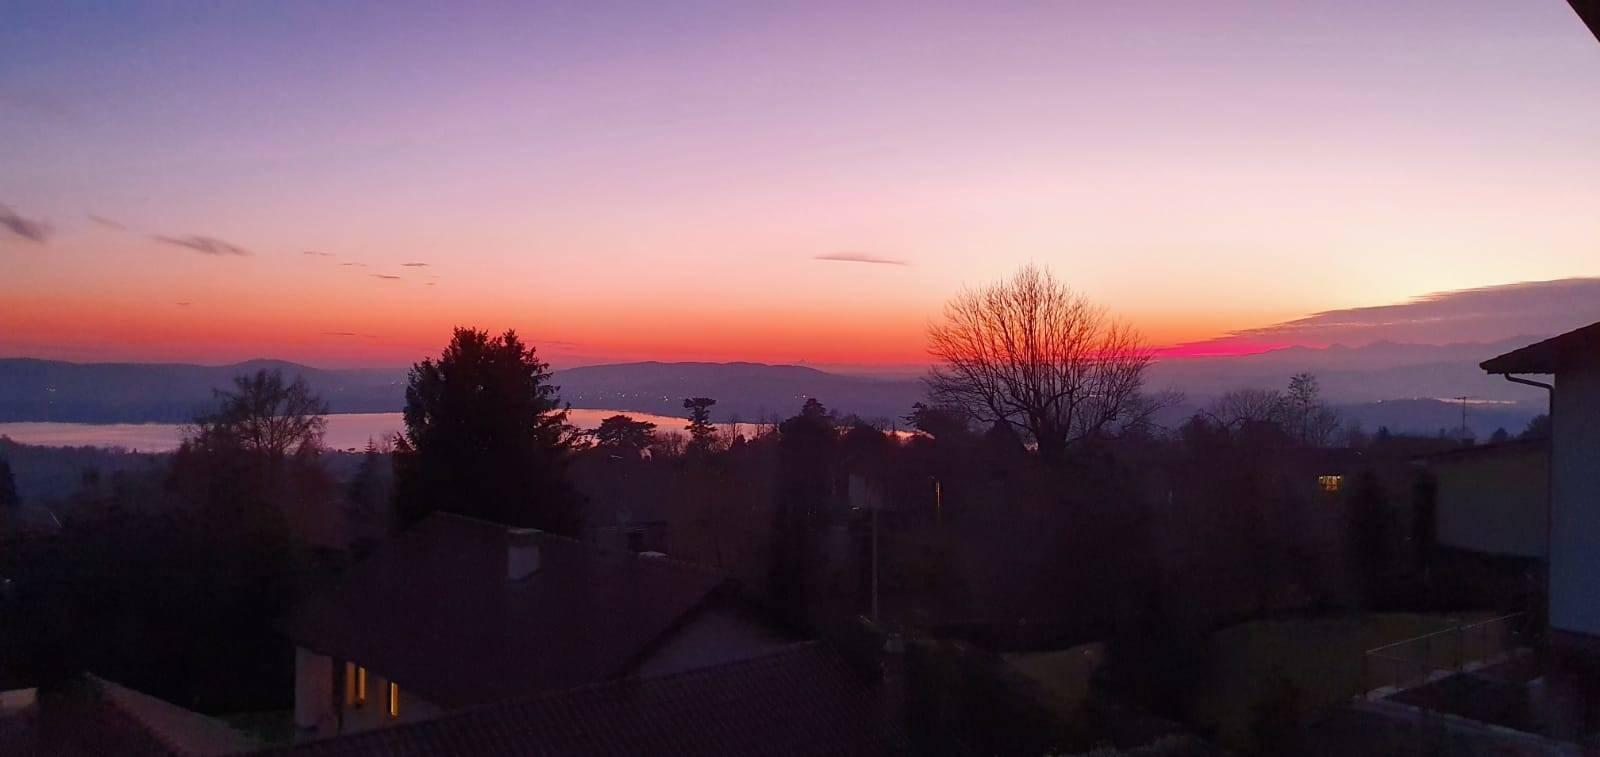 tramonto a barasso